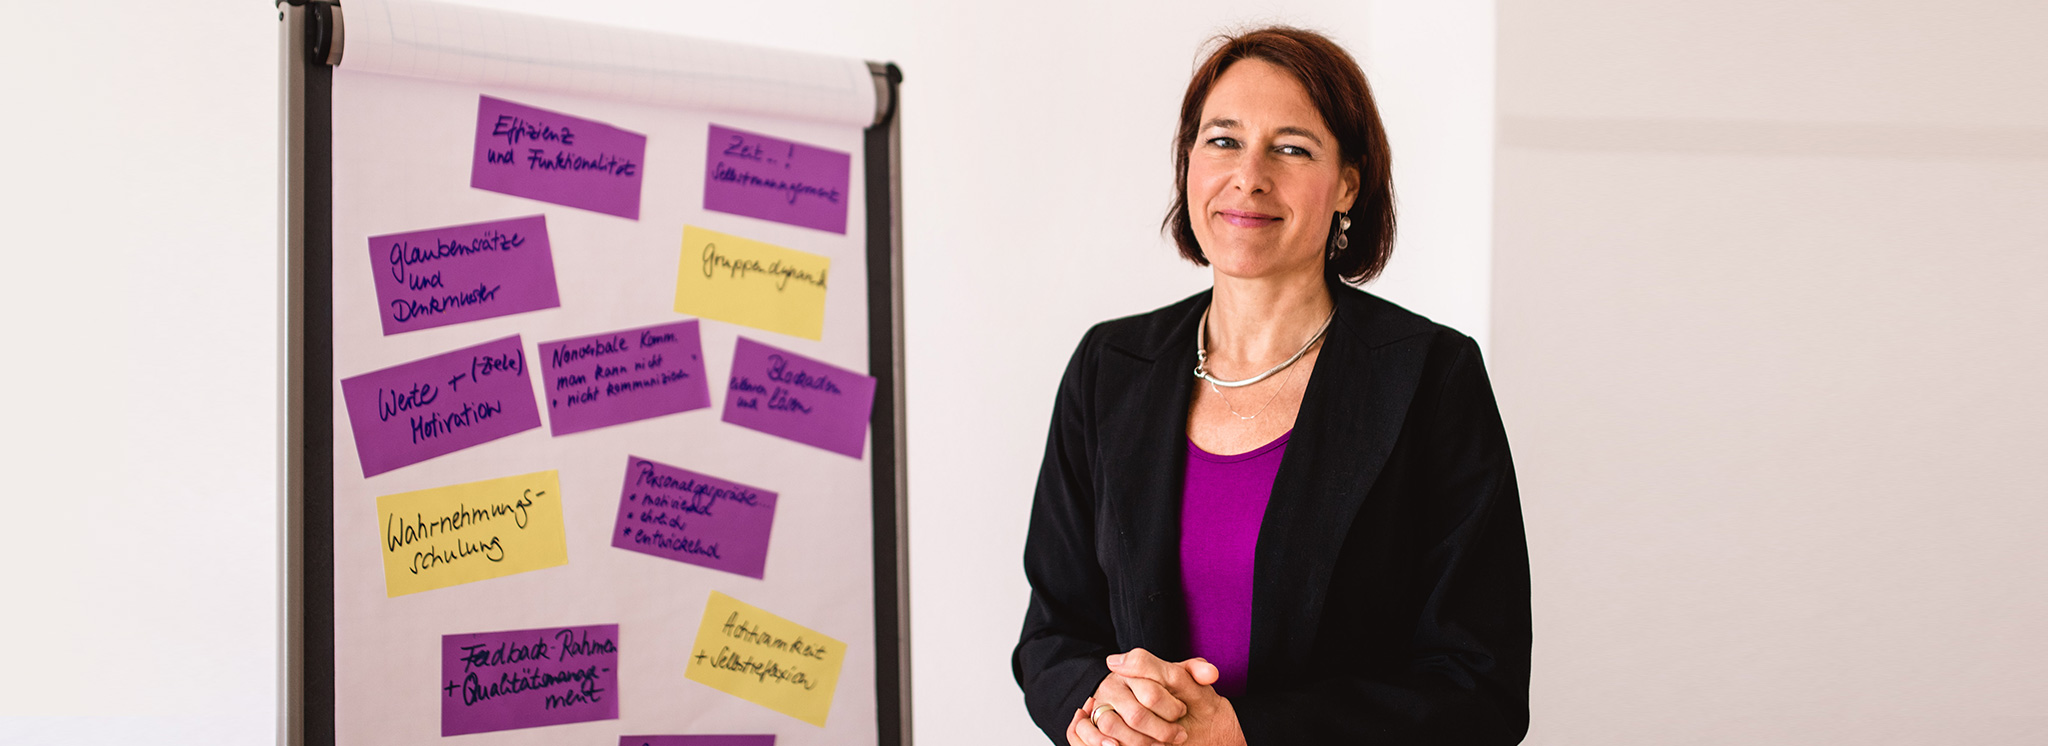 simply does Partnersuche für ms-kranke know site